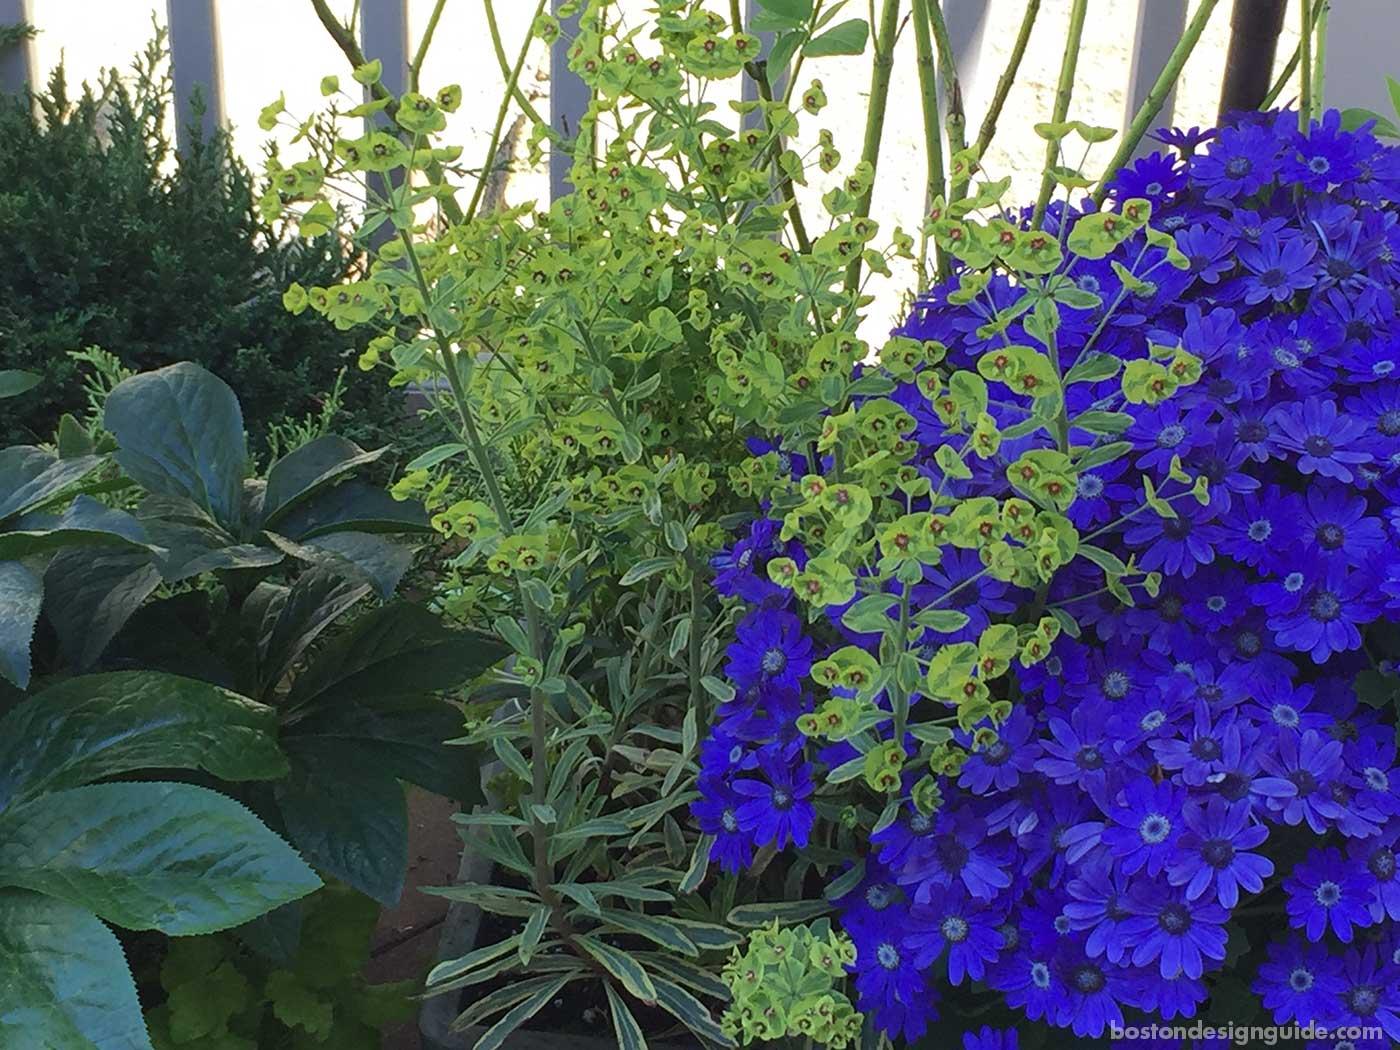 Seasonal tips for your yard